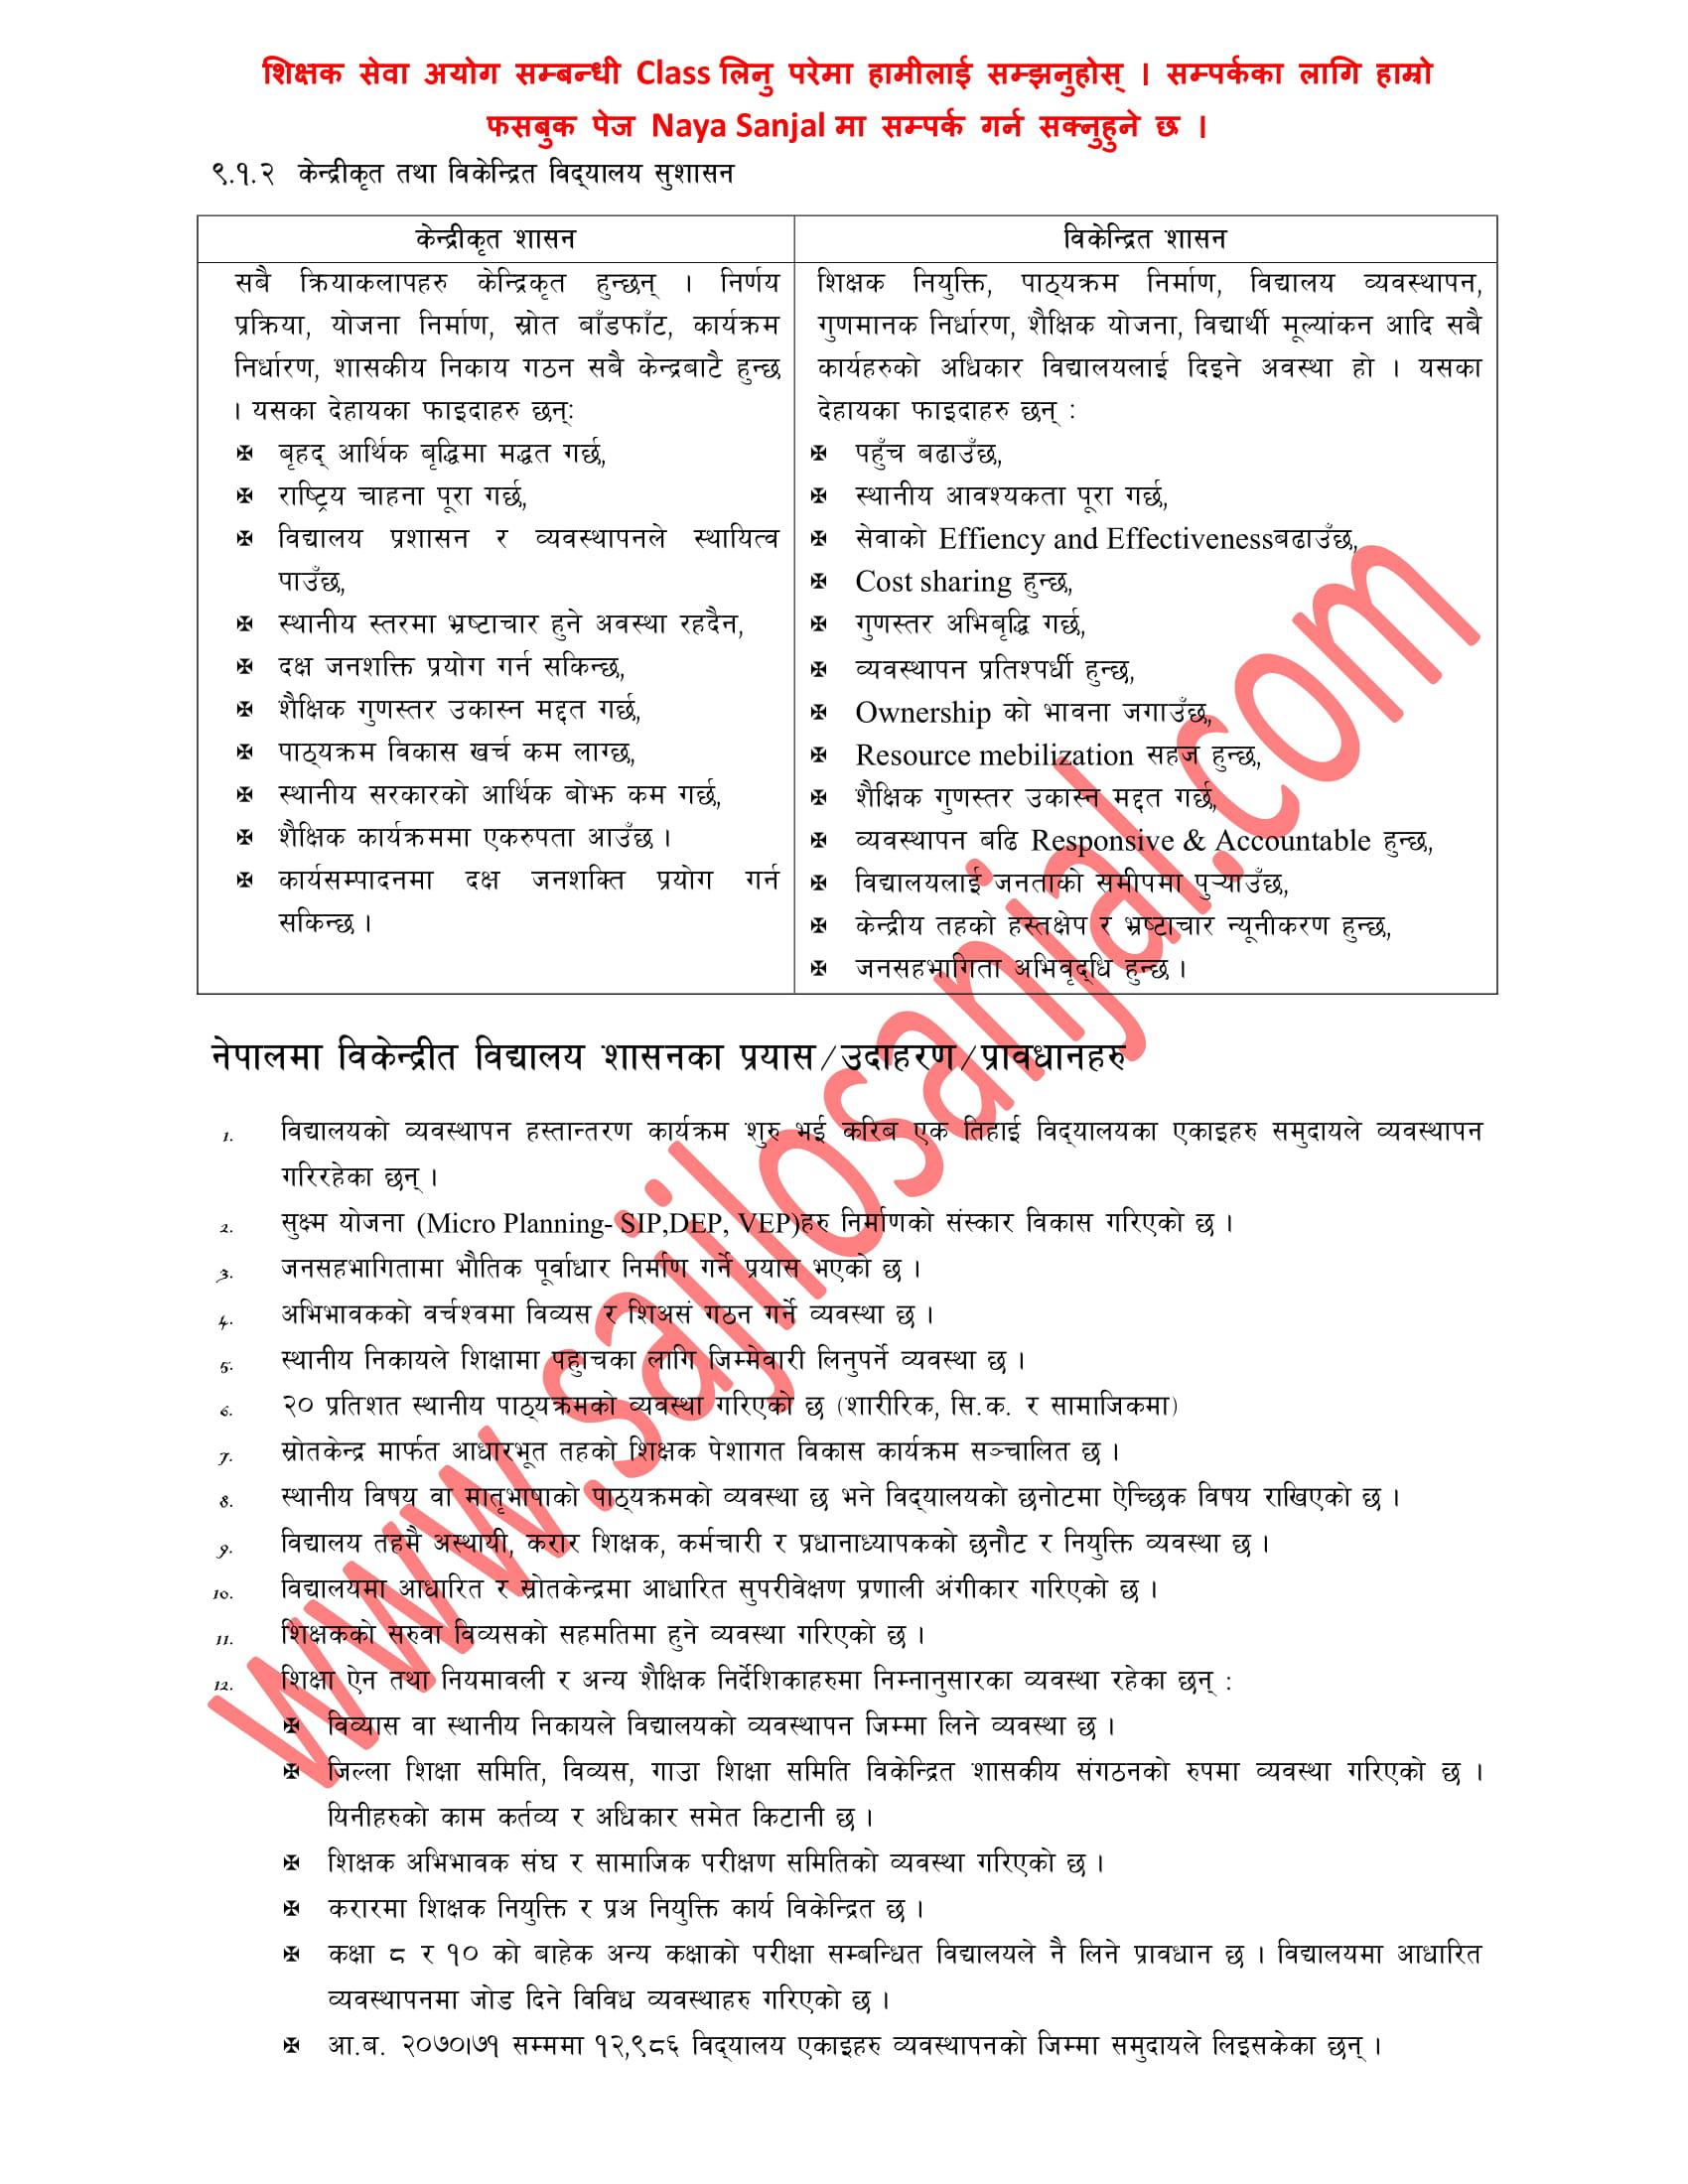 lshikshak sewa aayog form, TSC Nepal, TSC Nepal Advertisement, TSC Nepal form, TSC Nepal New Advertisement Notice, TSC online application,